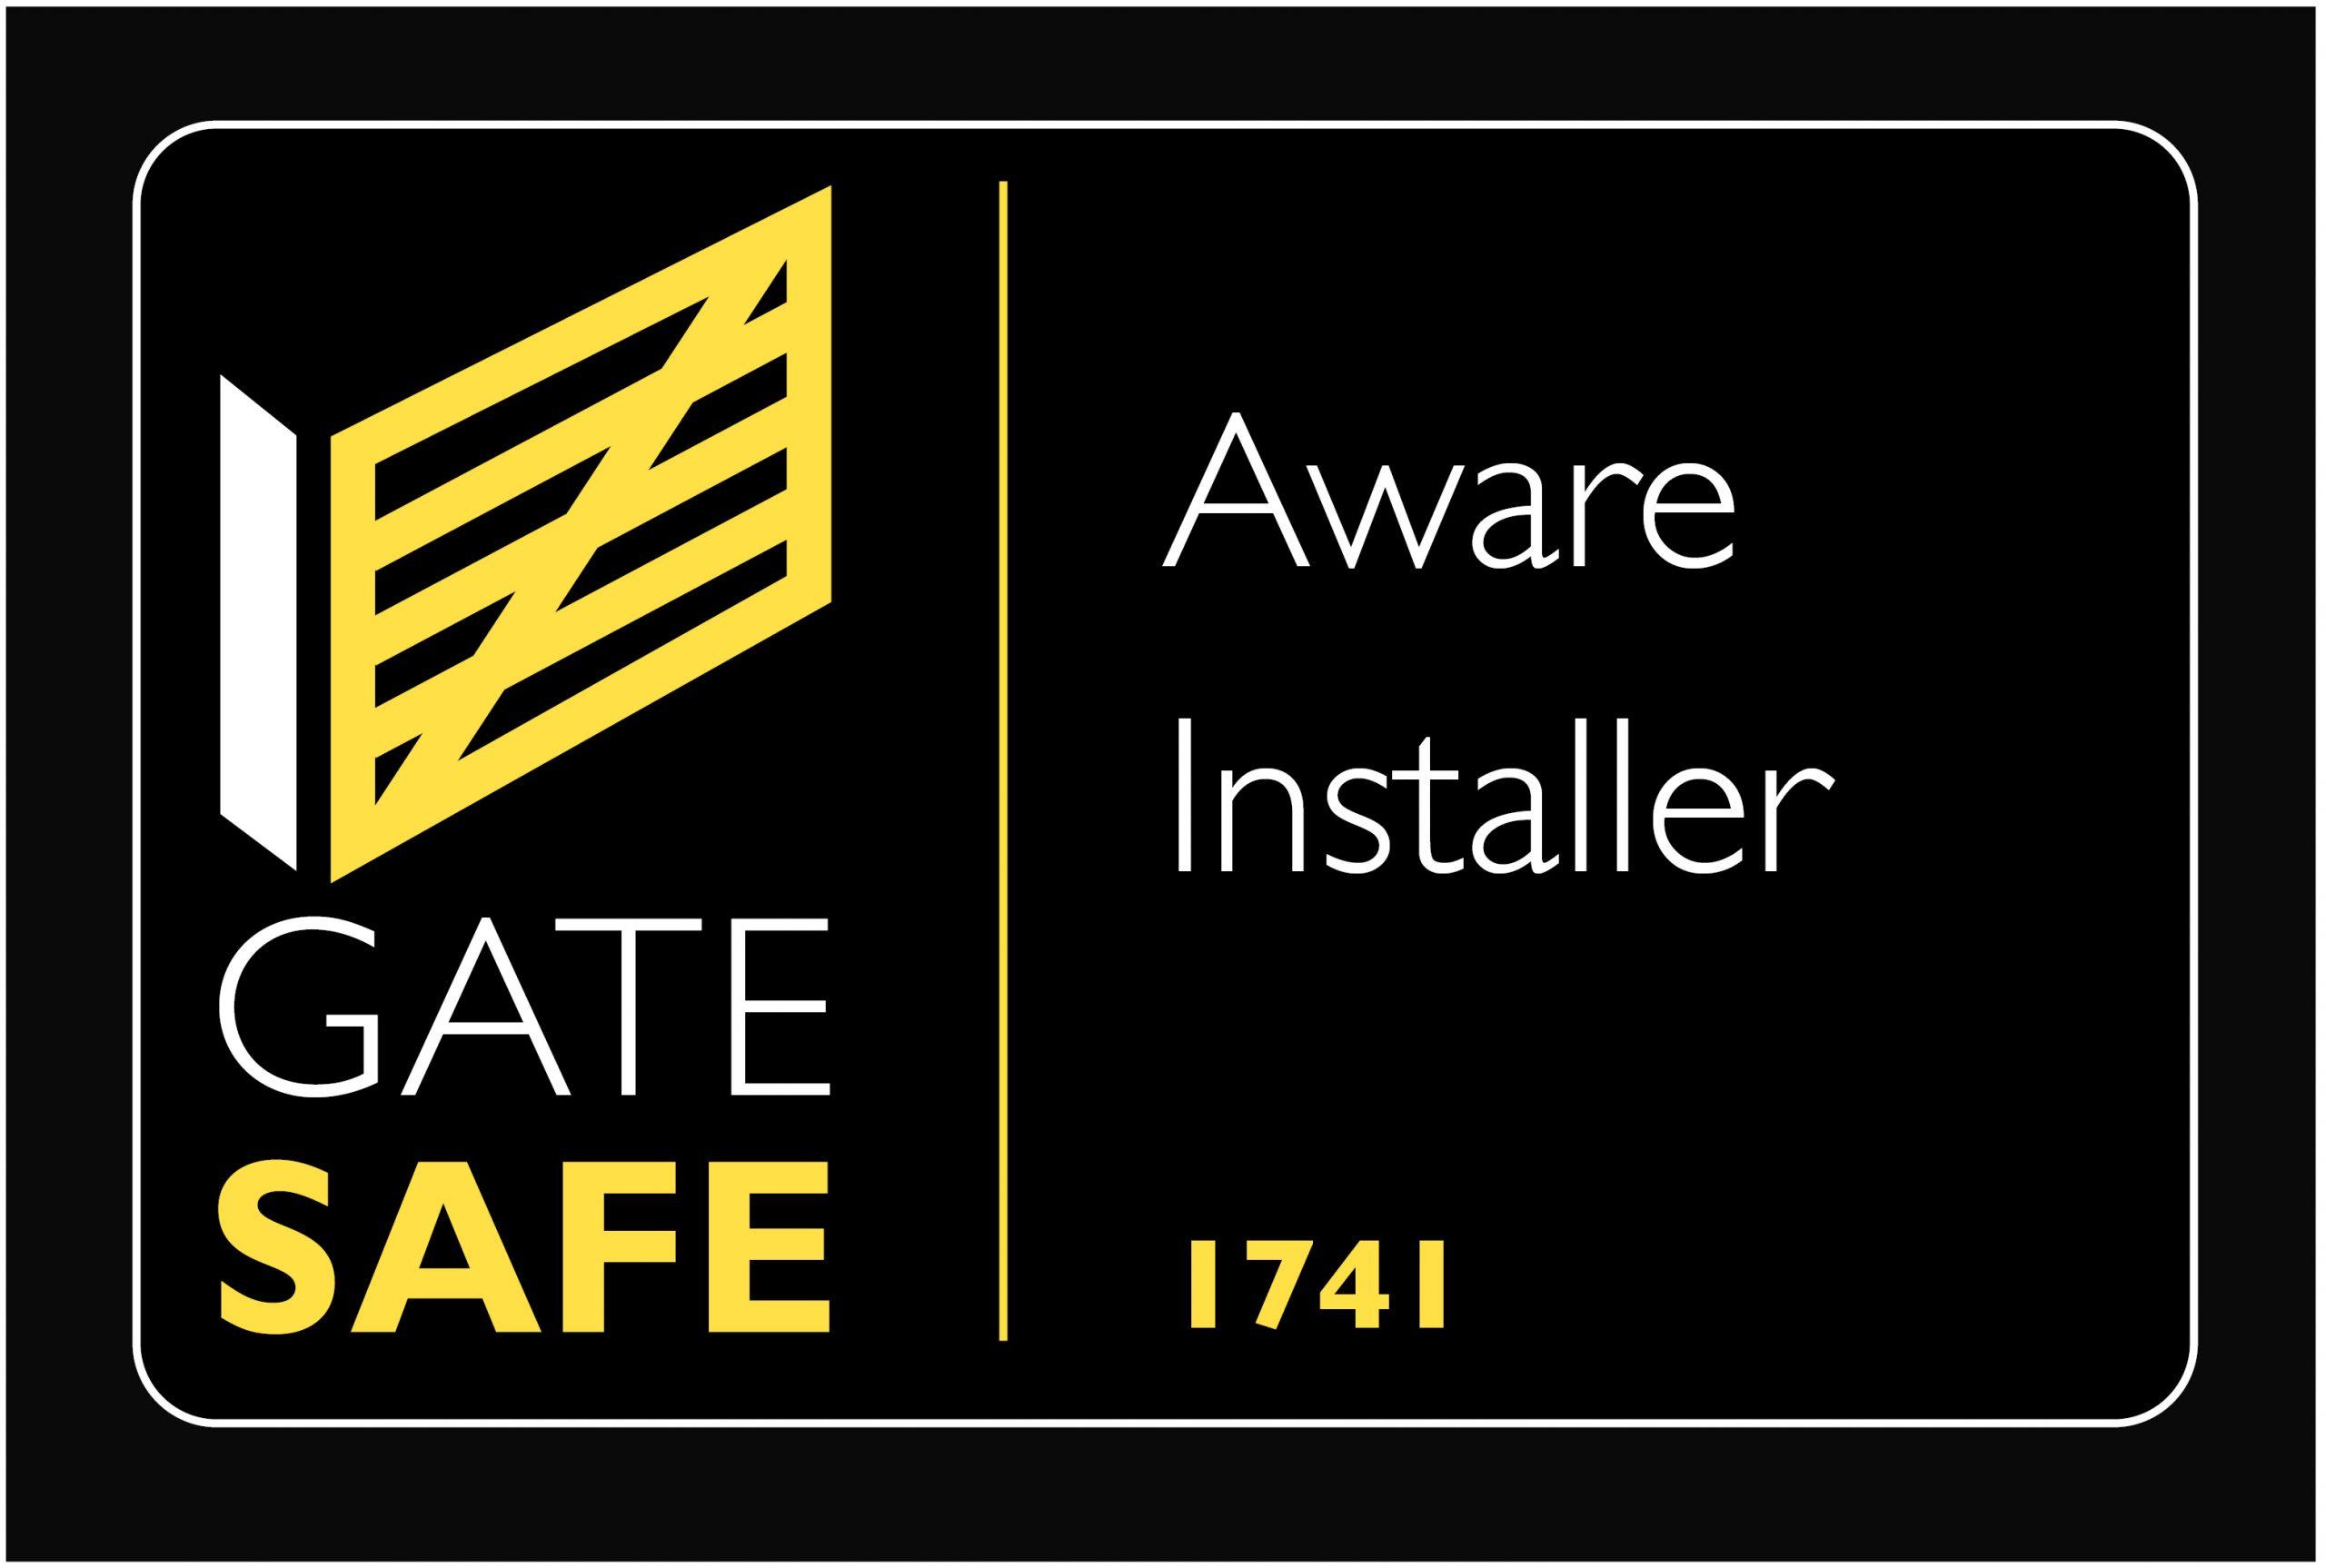 Gate safe logo company 1741 Hawk Property Protection